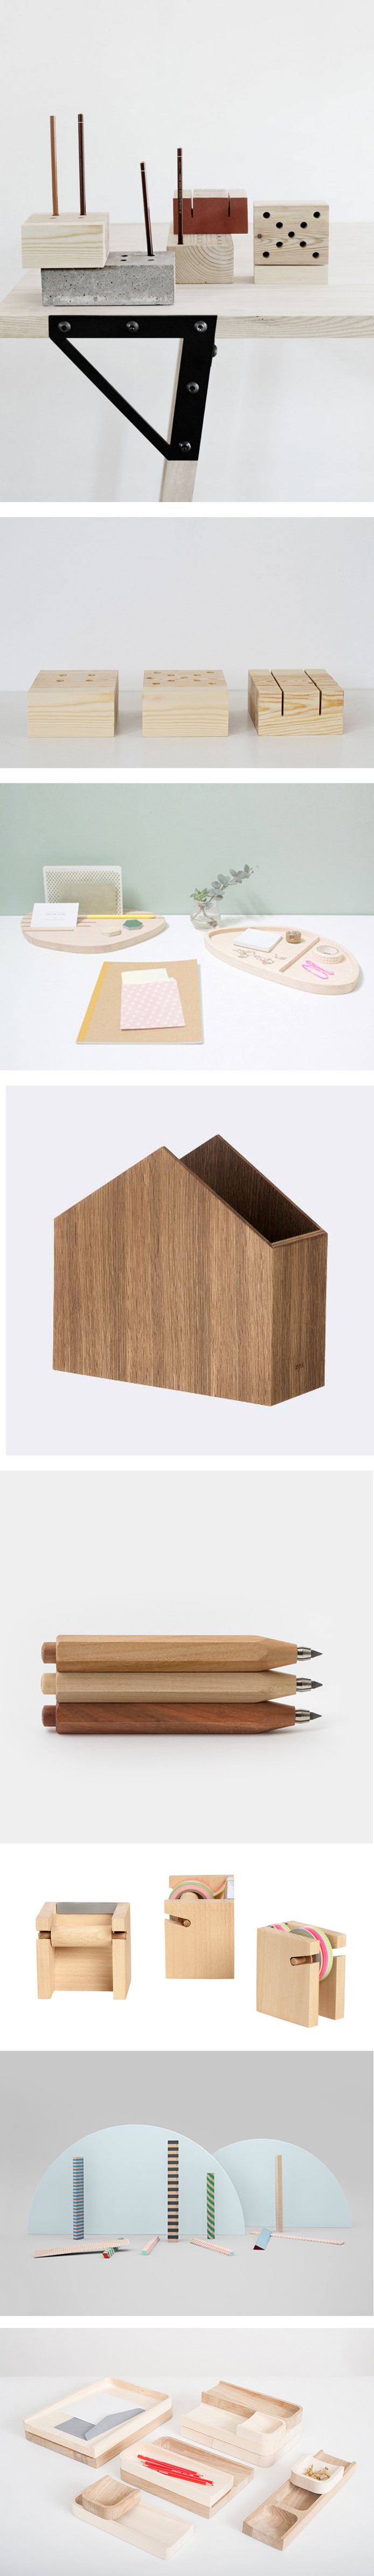 On Your Desk I Wooden Stuff